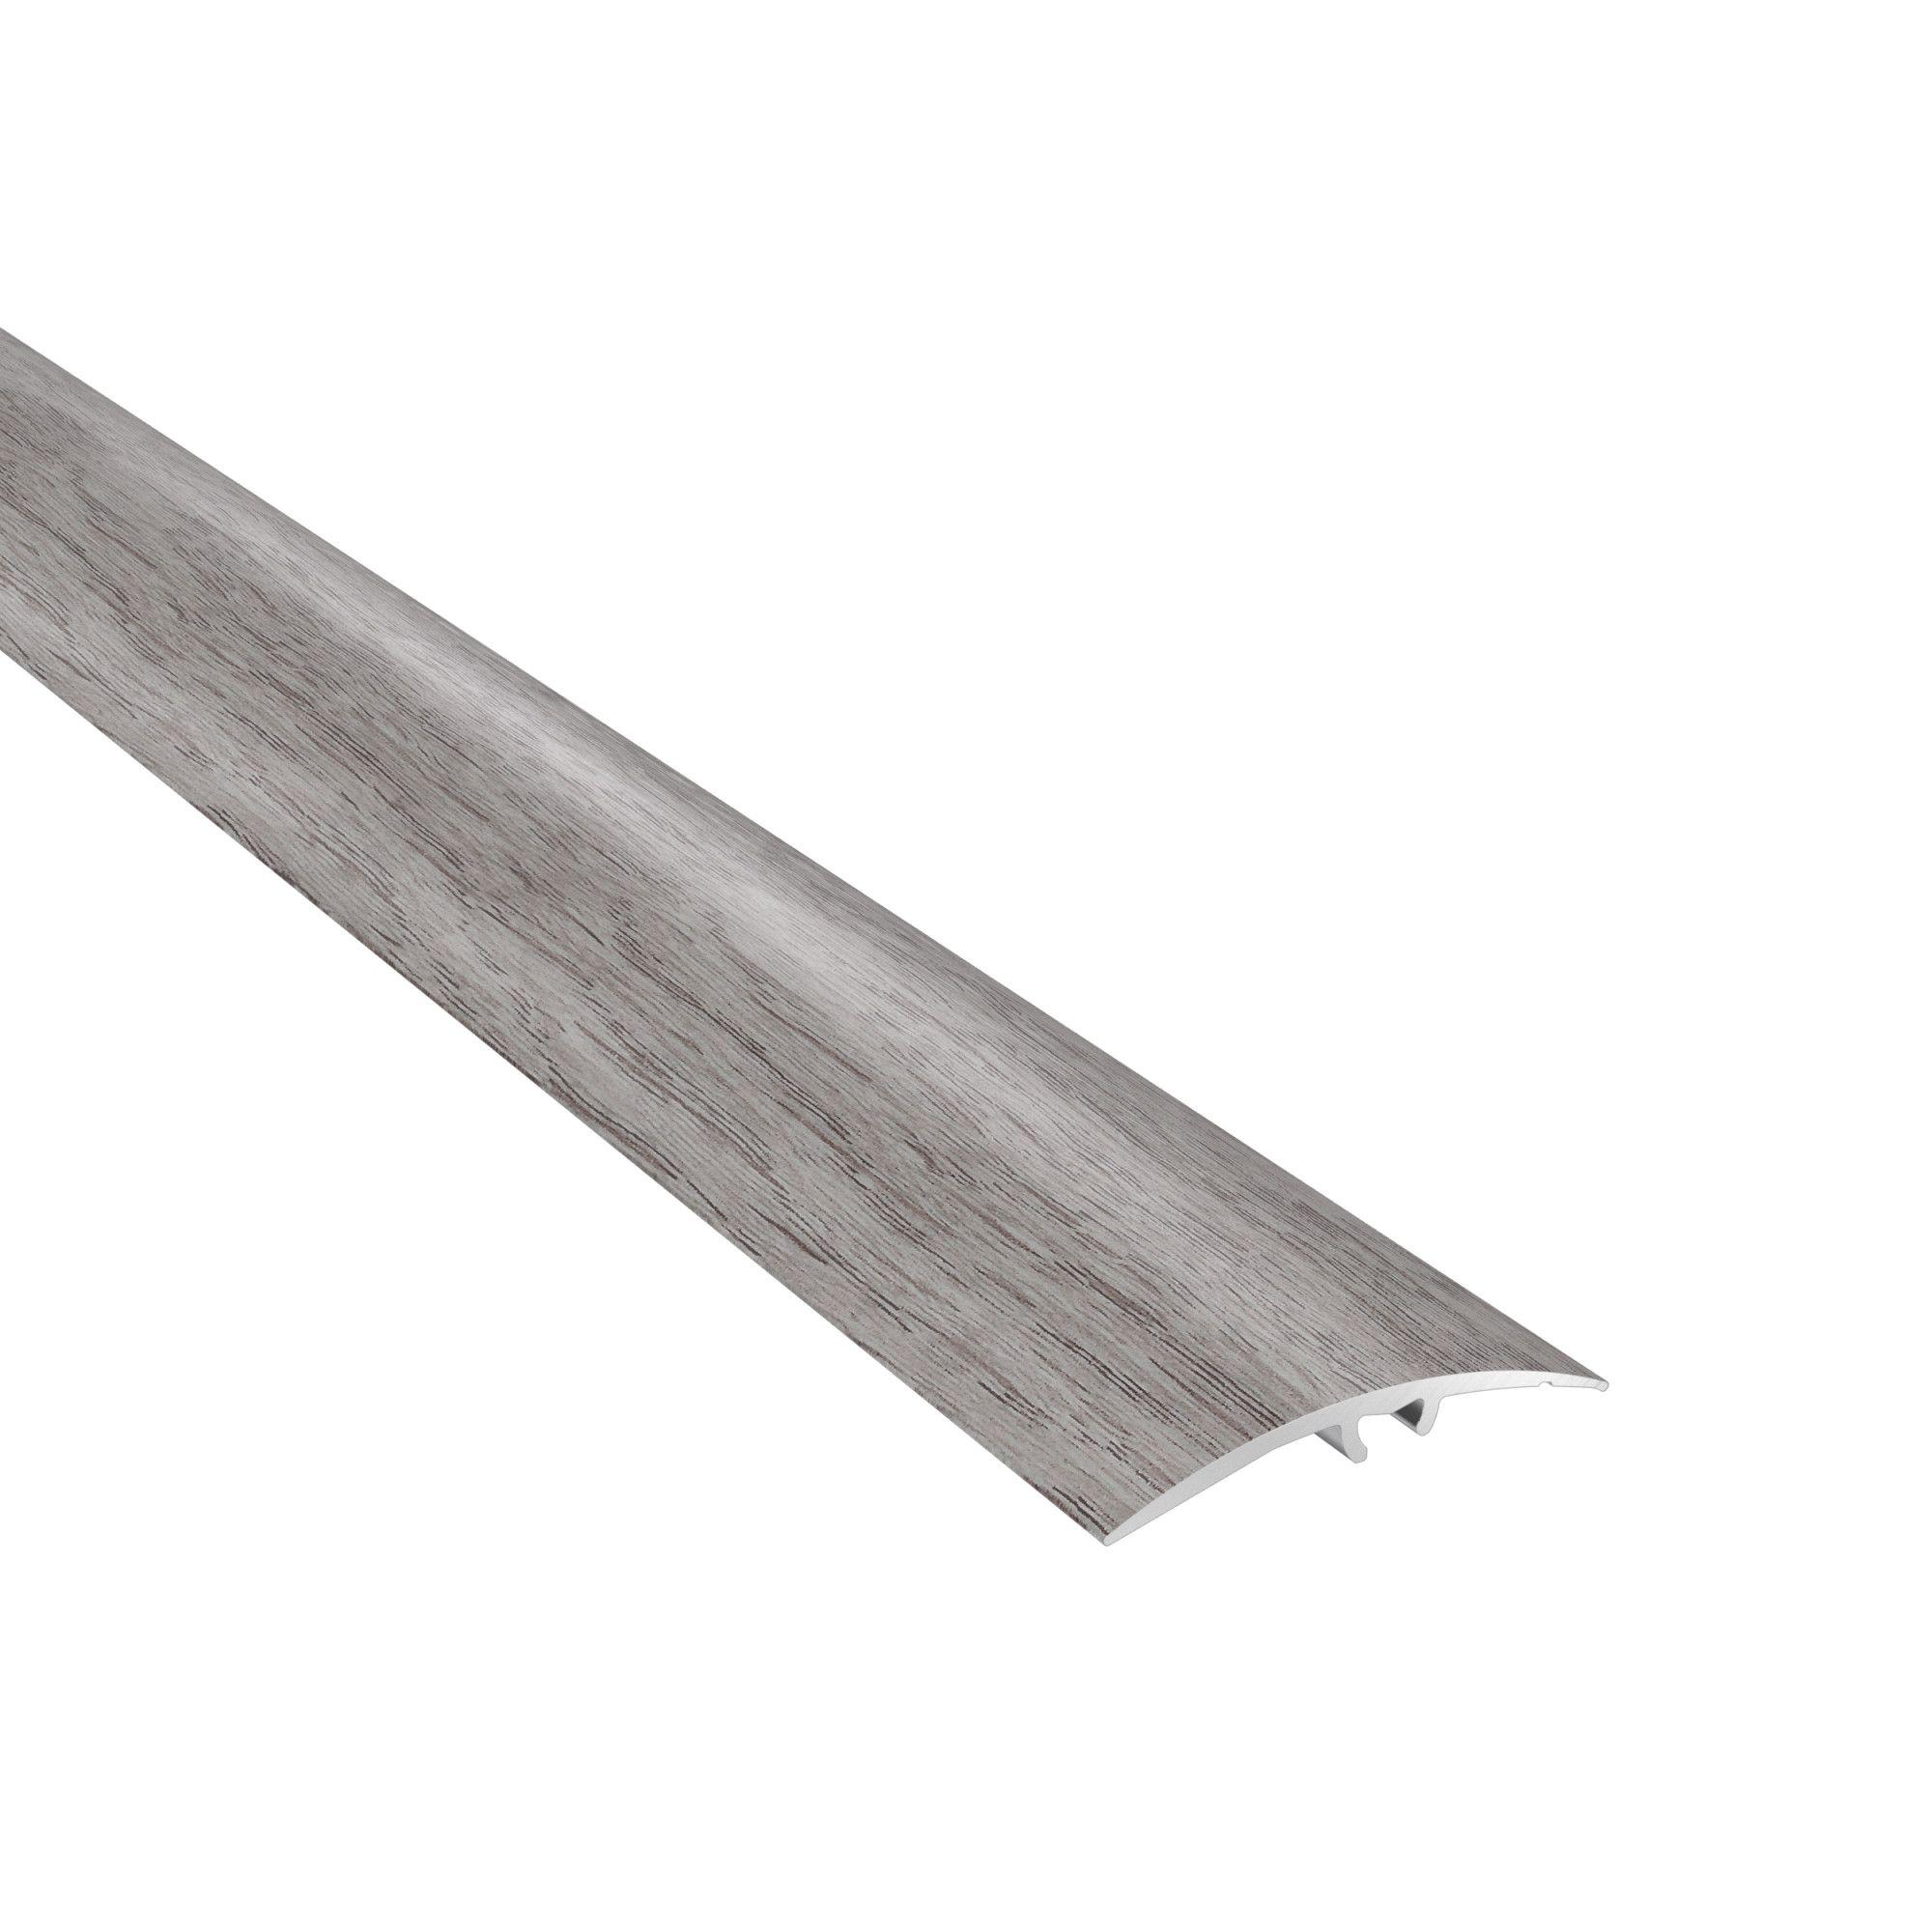 Profil de trecere cu surub mascat, diferenta de nivel SM3 Decora Arbiton, stejar boston, 0,93 m imagine MatHaus